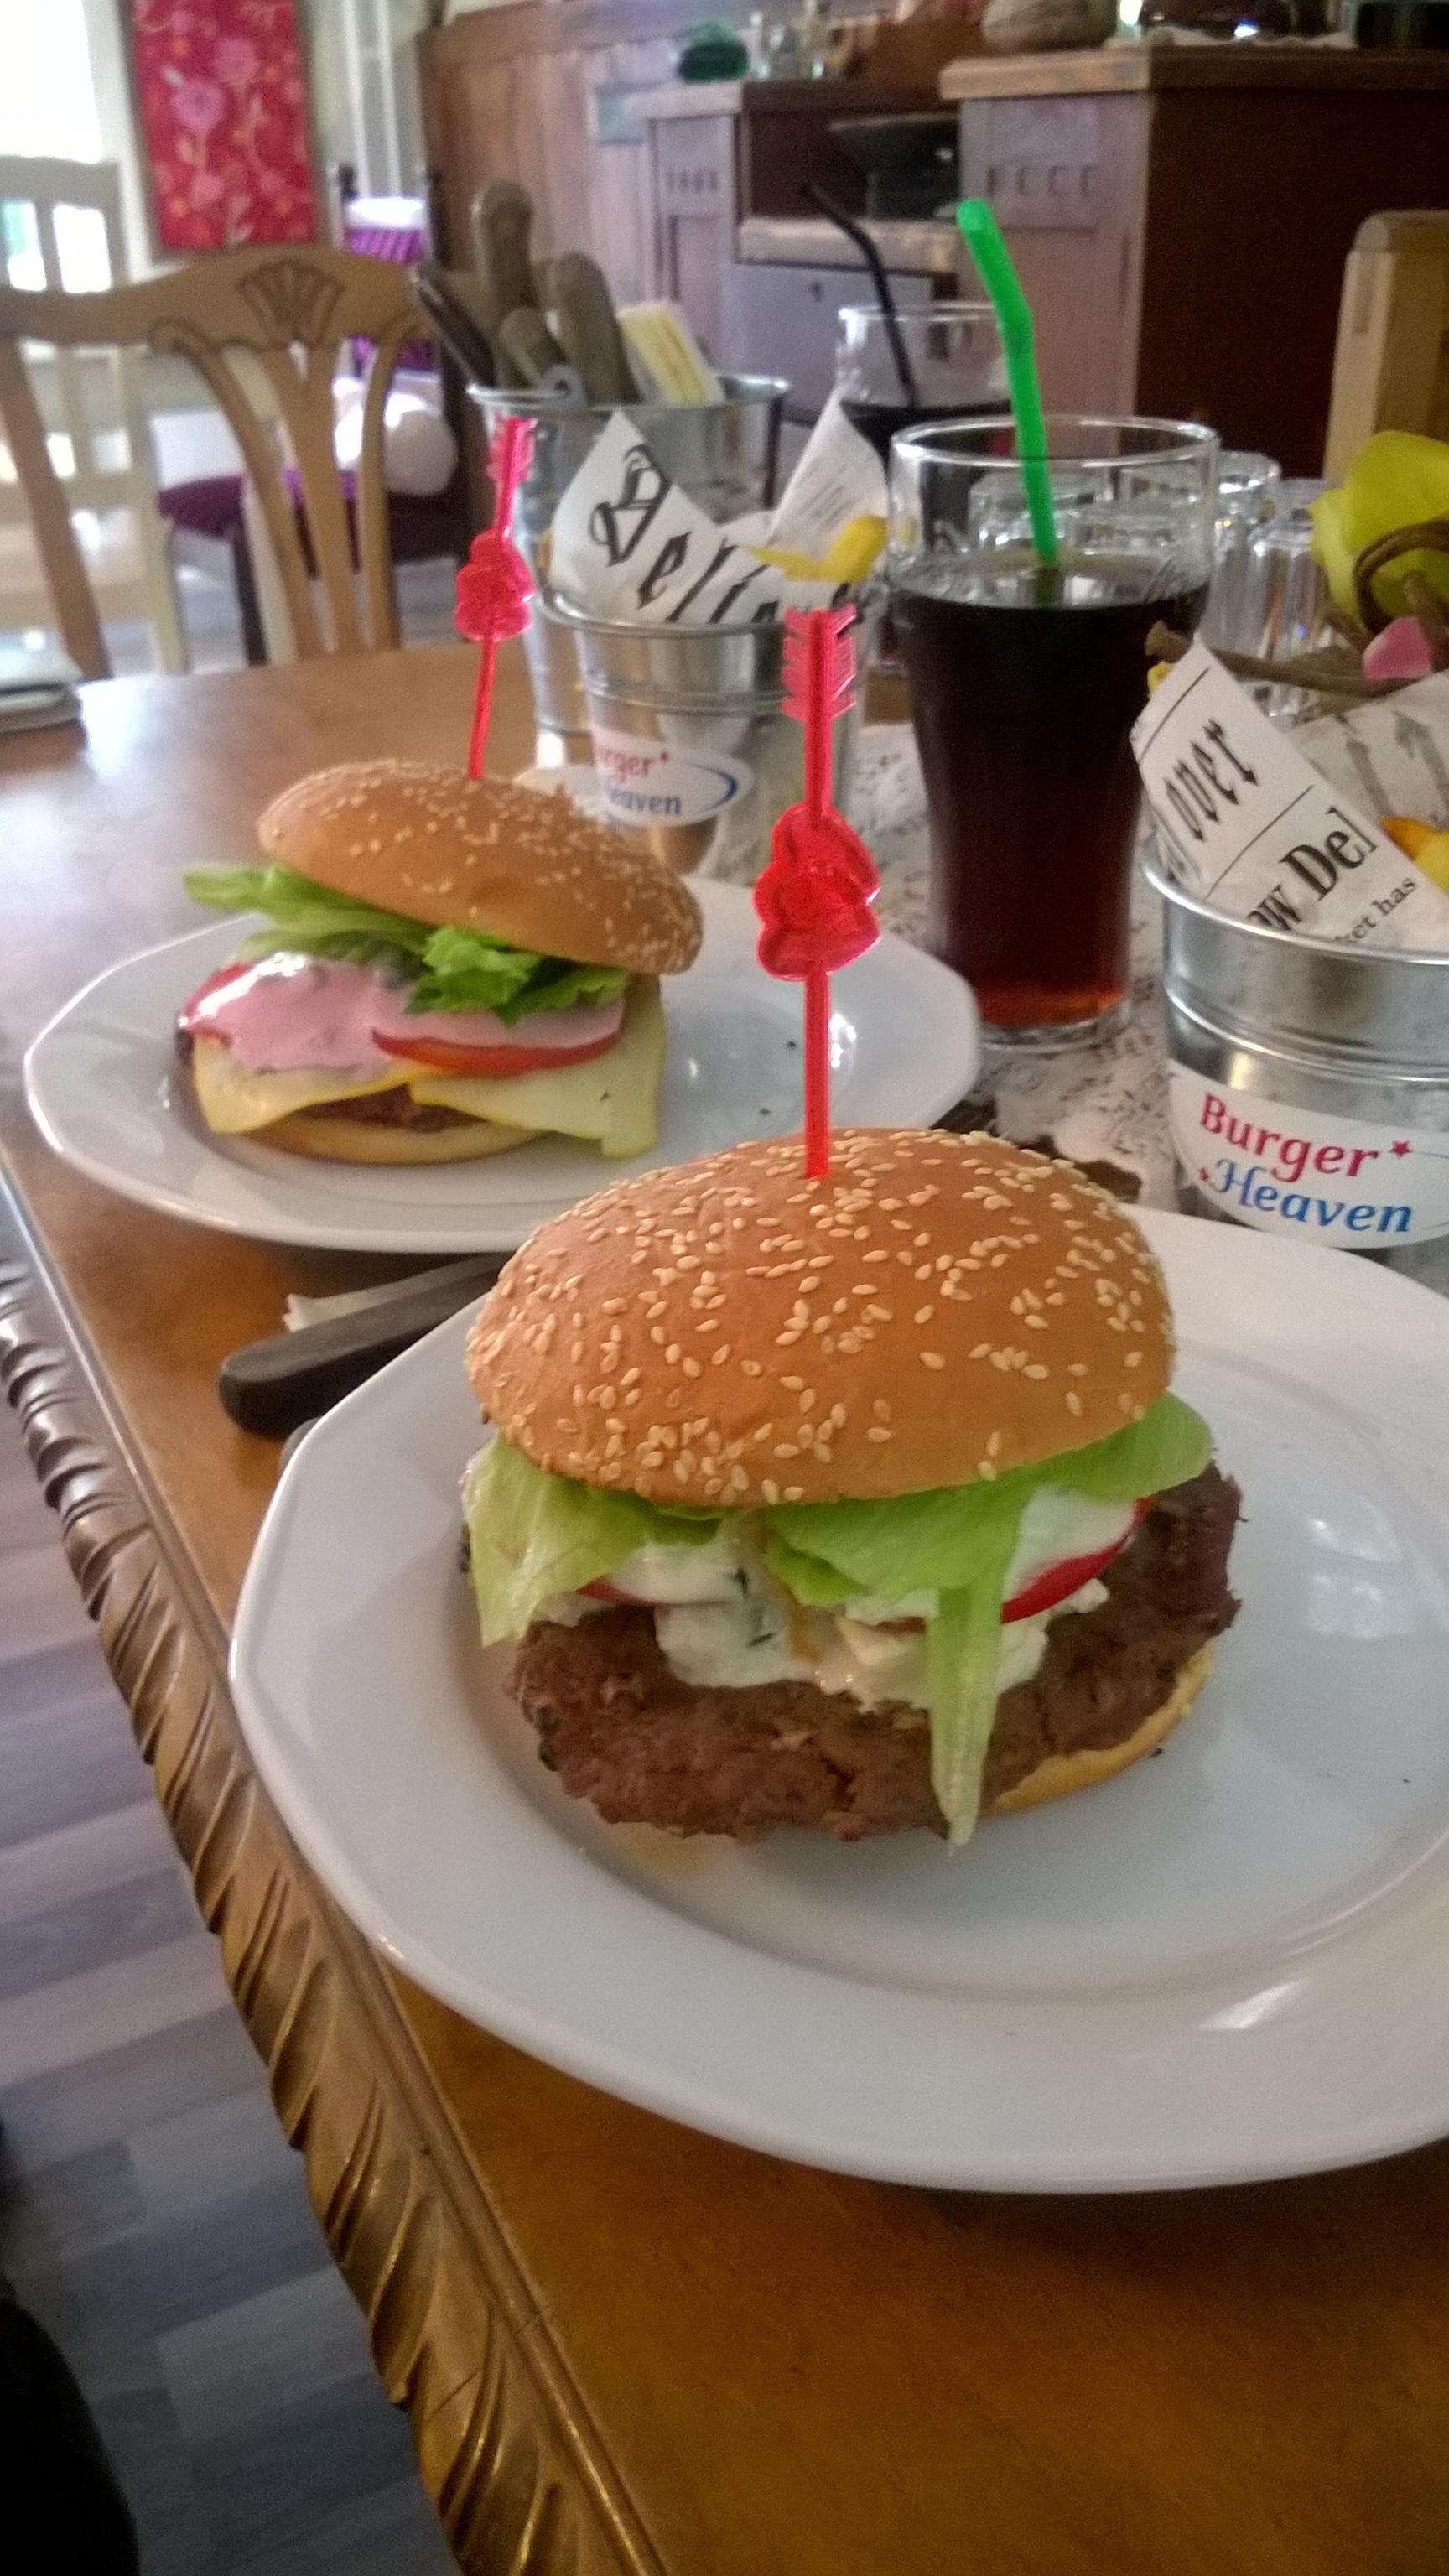 Burger Heaven, Savitaipale